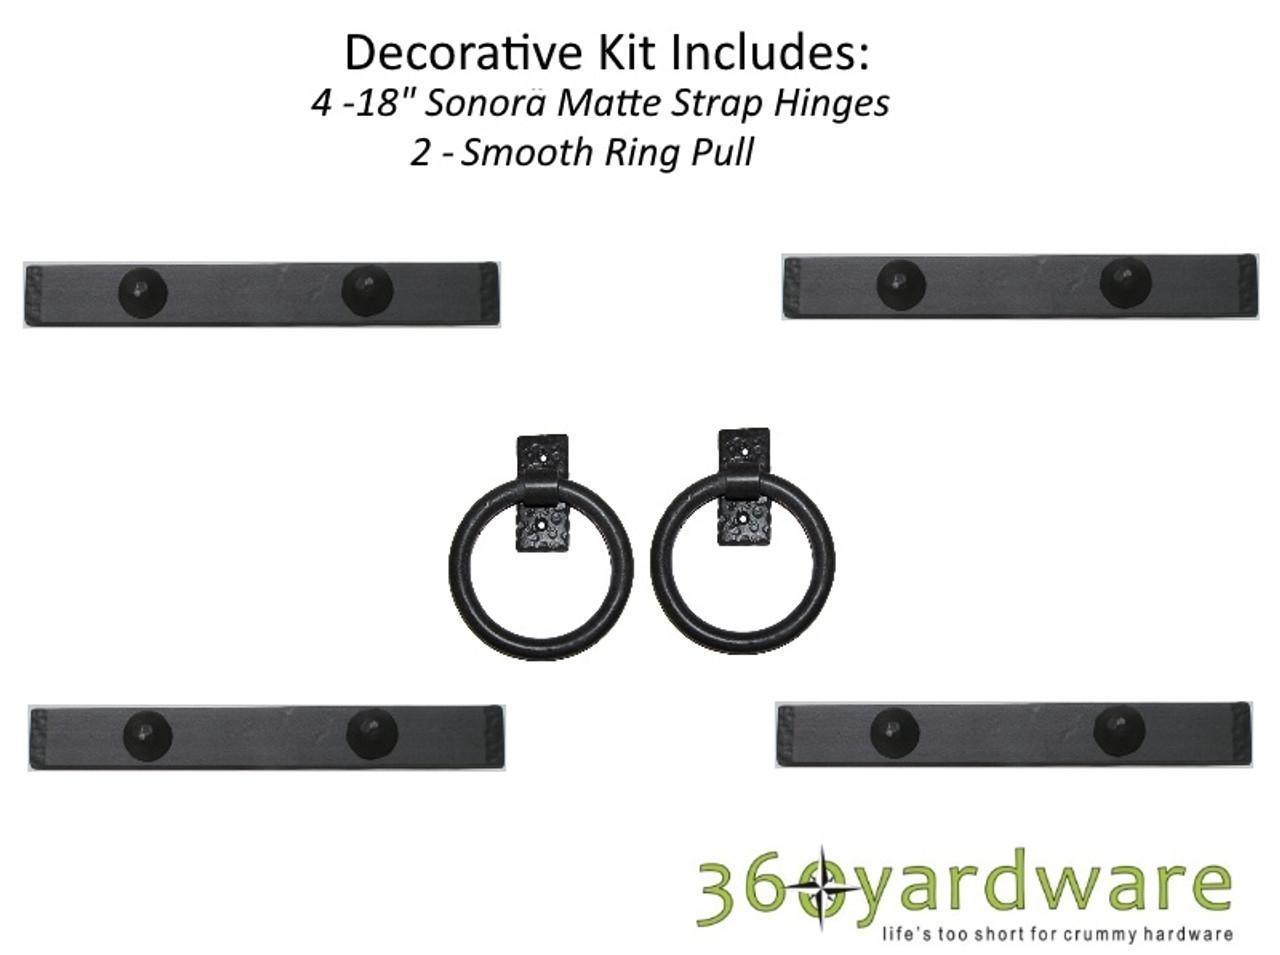 Incroyable Southwest Style Decorative Garage Door Kit